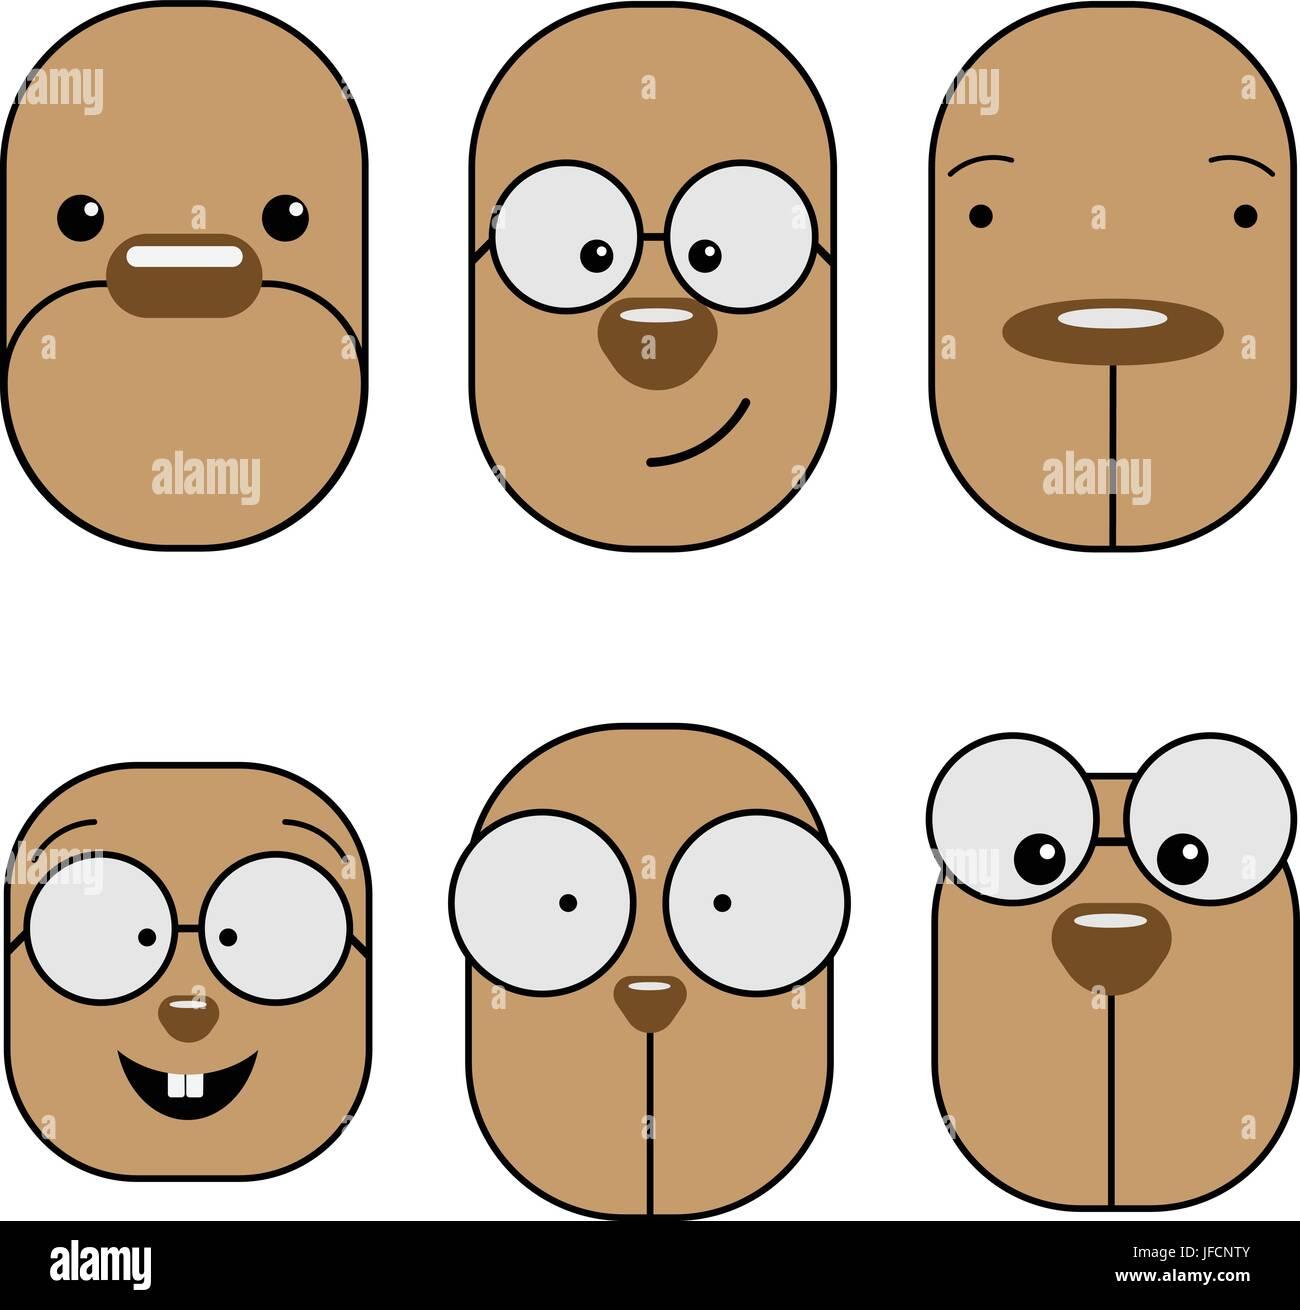 Emoji emoticon expression. - Stock Image